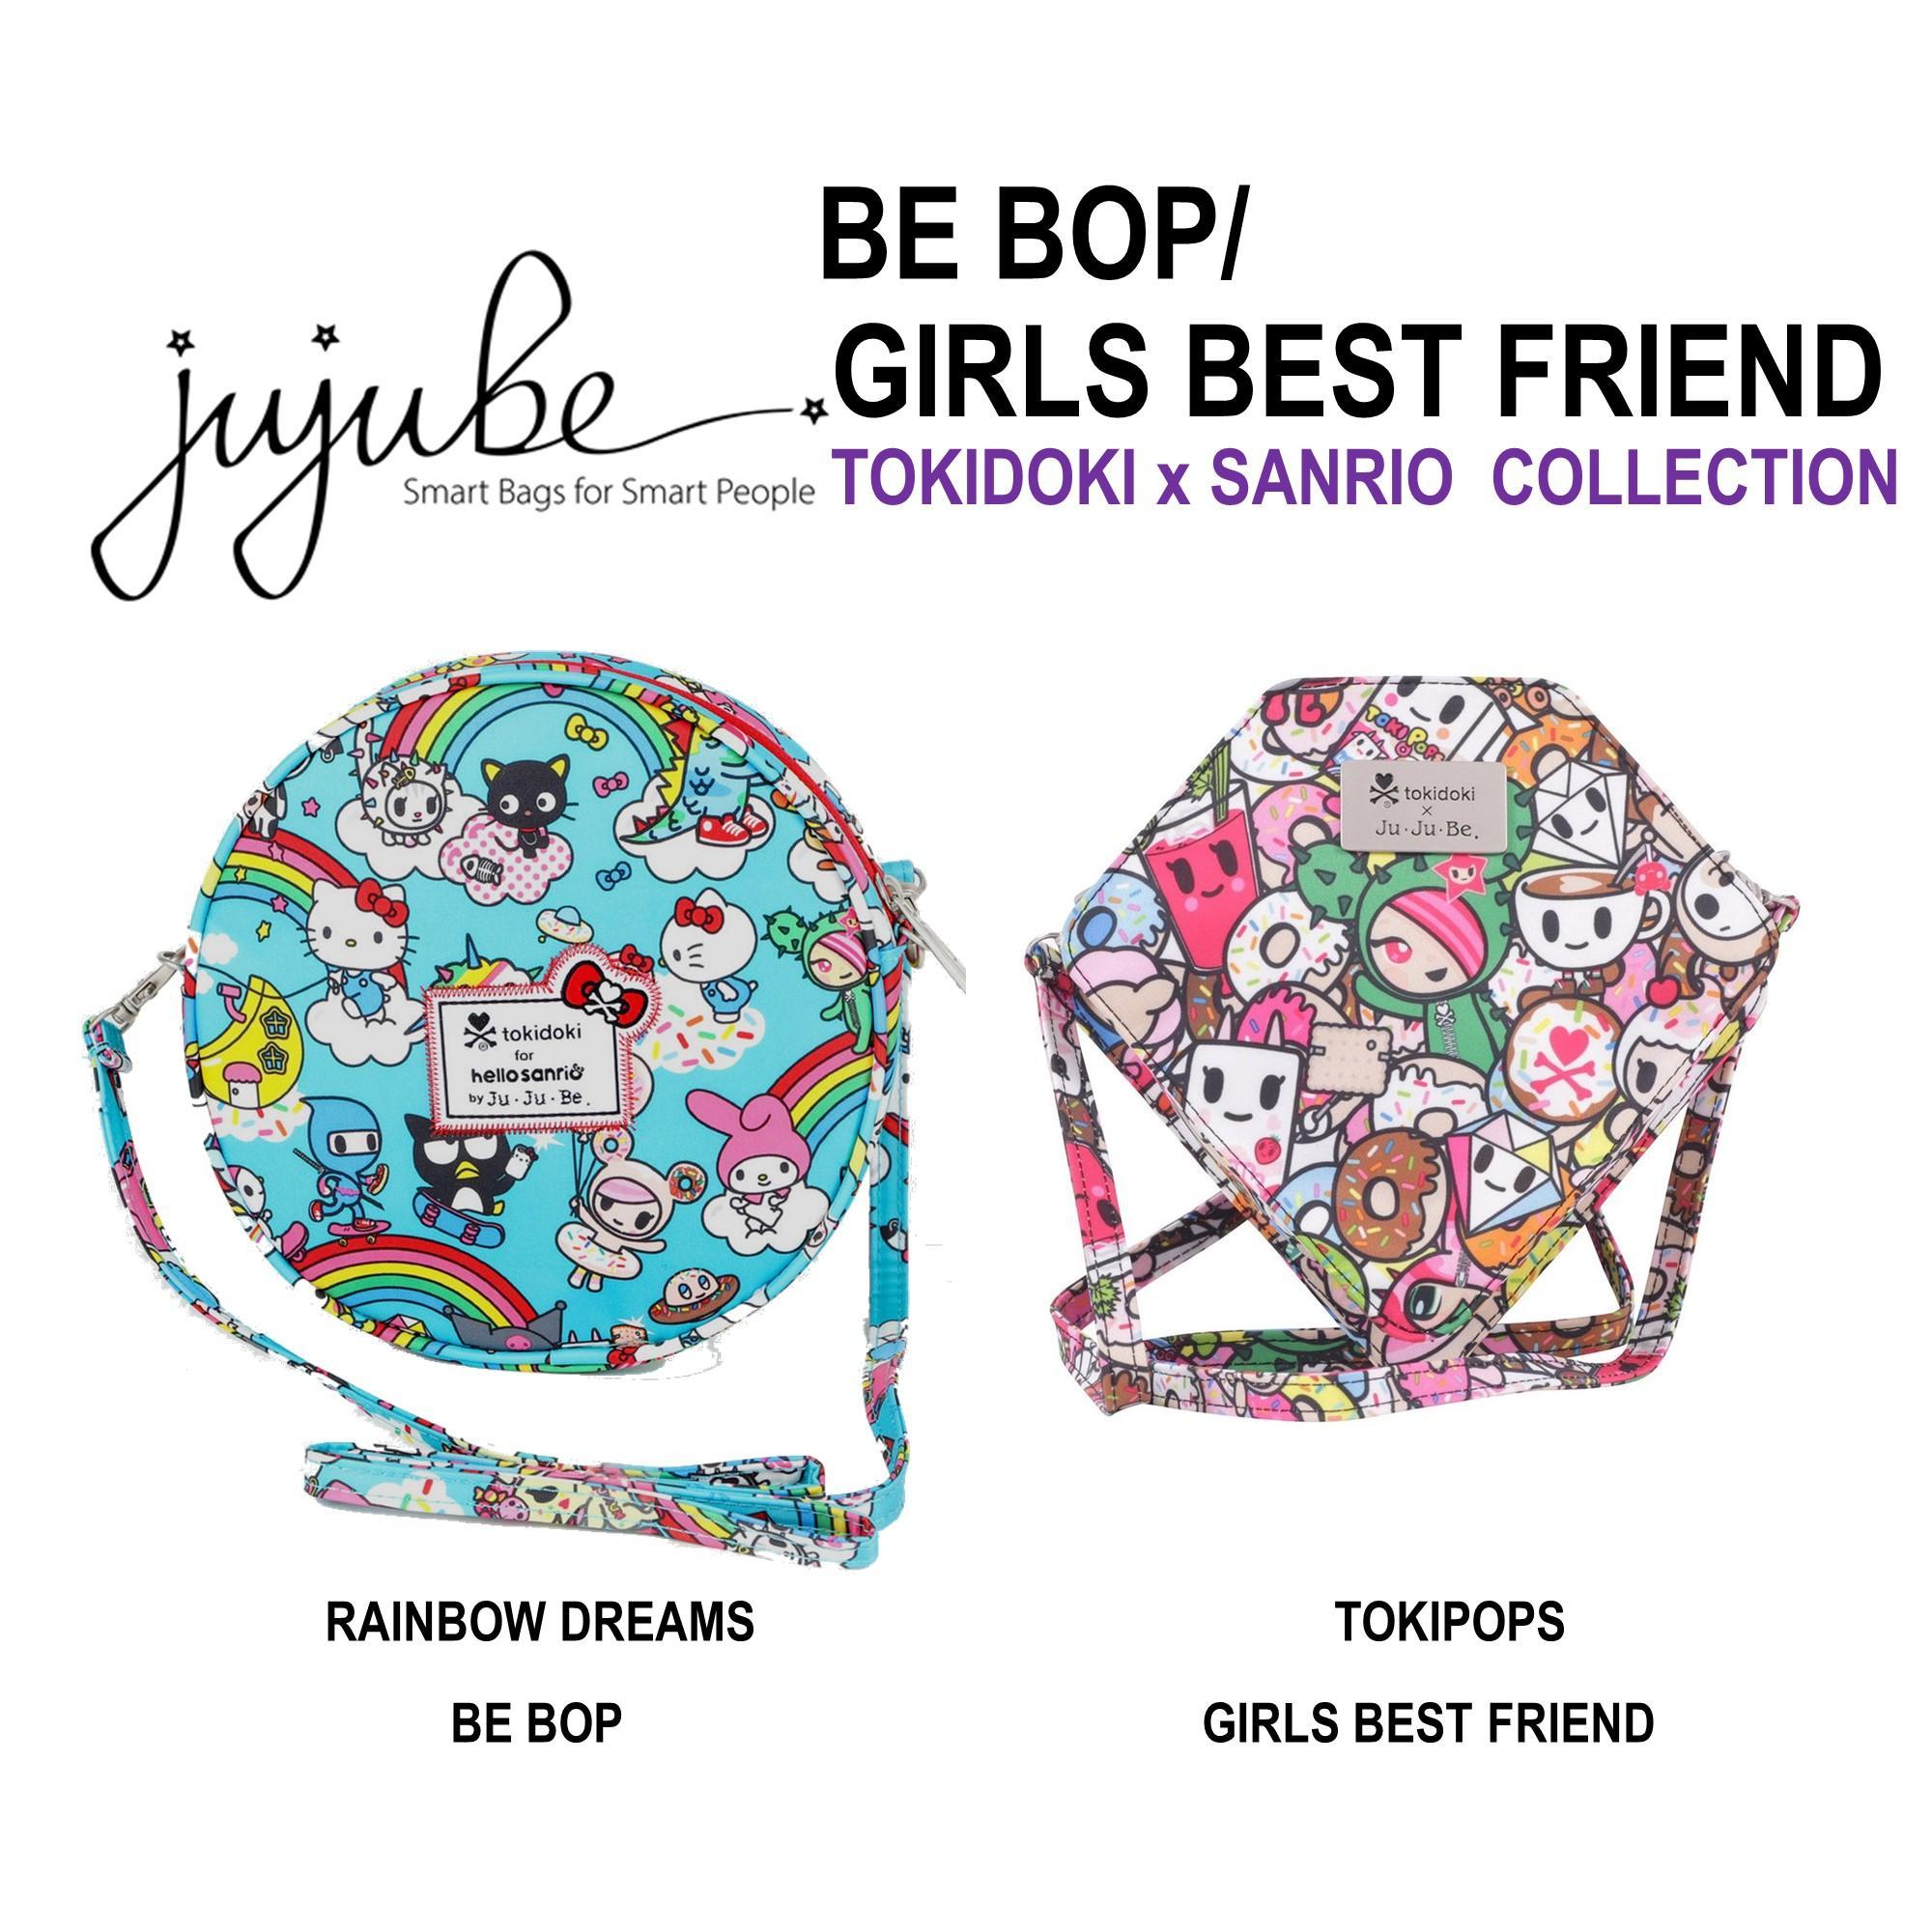 Jujube ∣  Ju-Ju-Be [ Tokipops Girls Best Friend . Rainbow Dreams Be Bop ] Crossbody bag, Tokidoki x Sanrio Collection